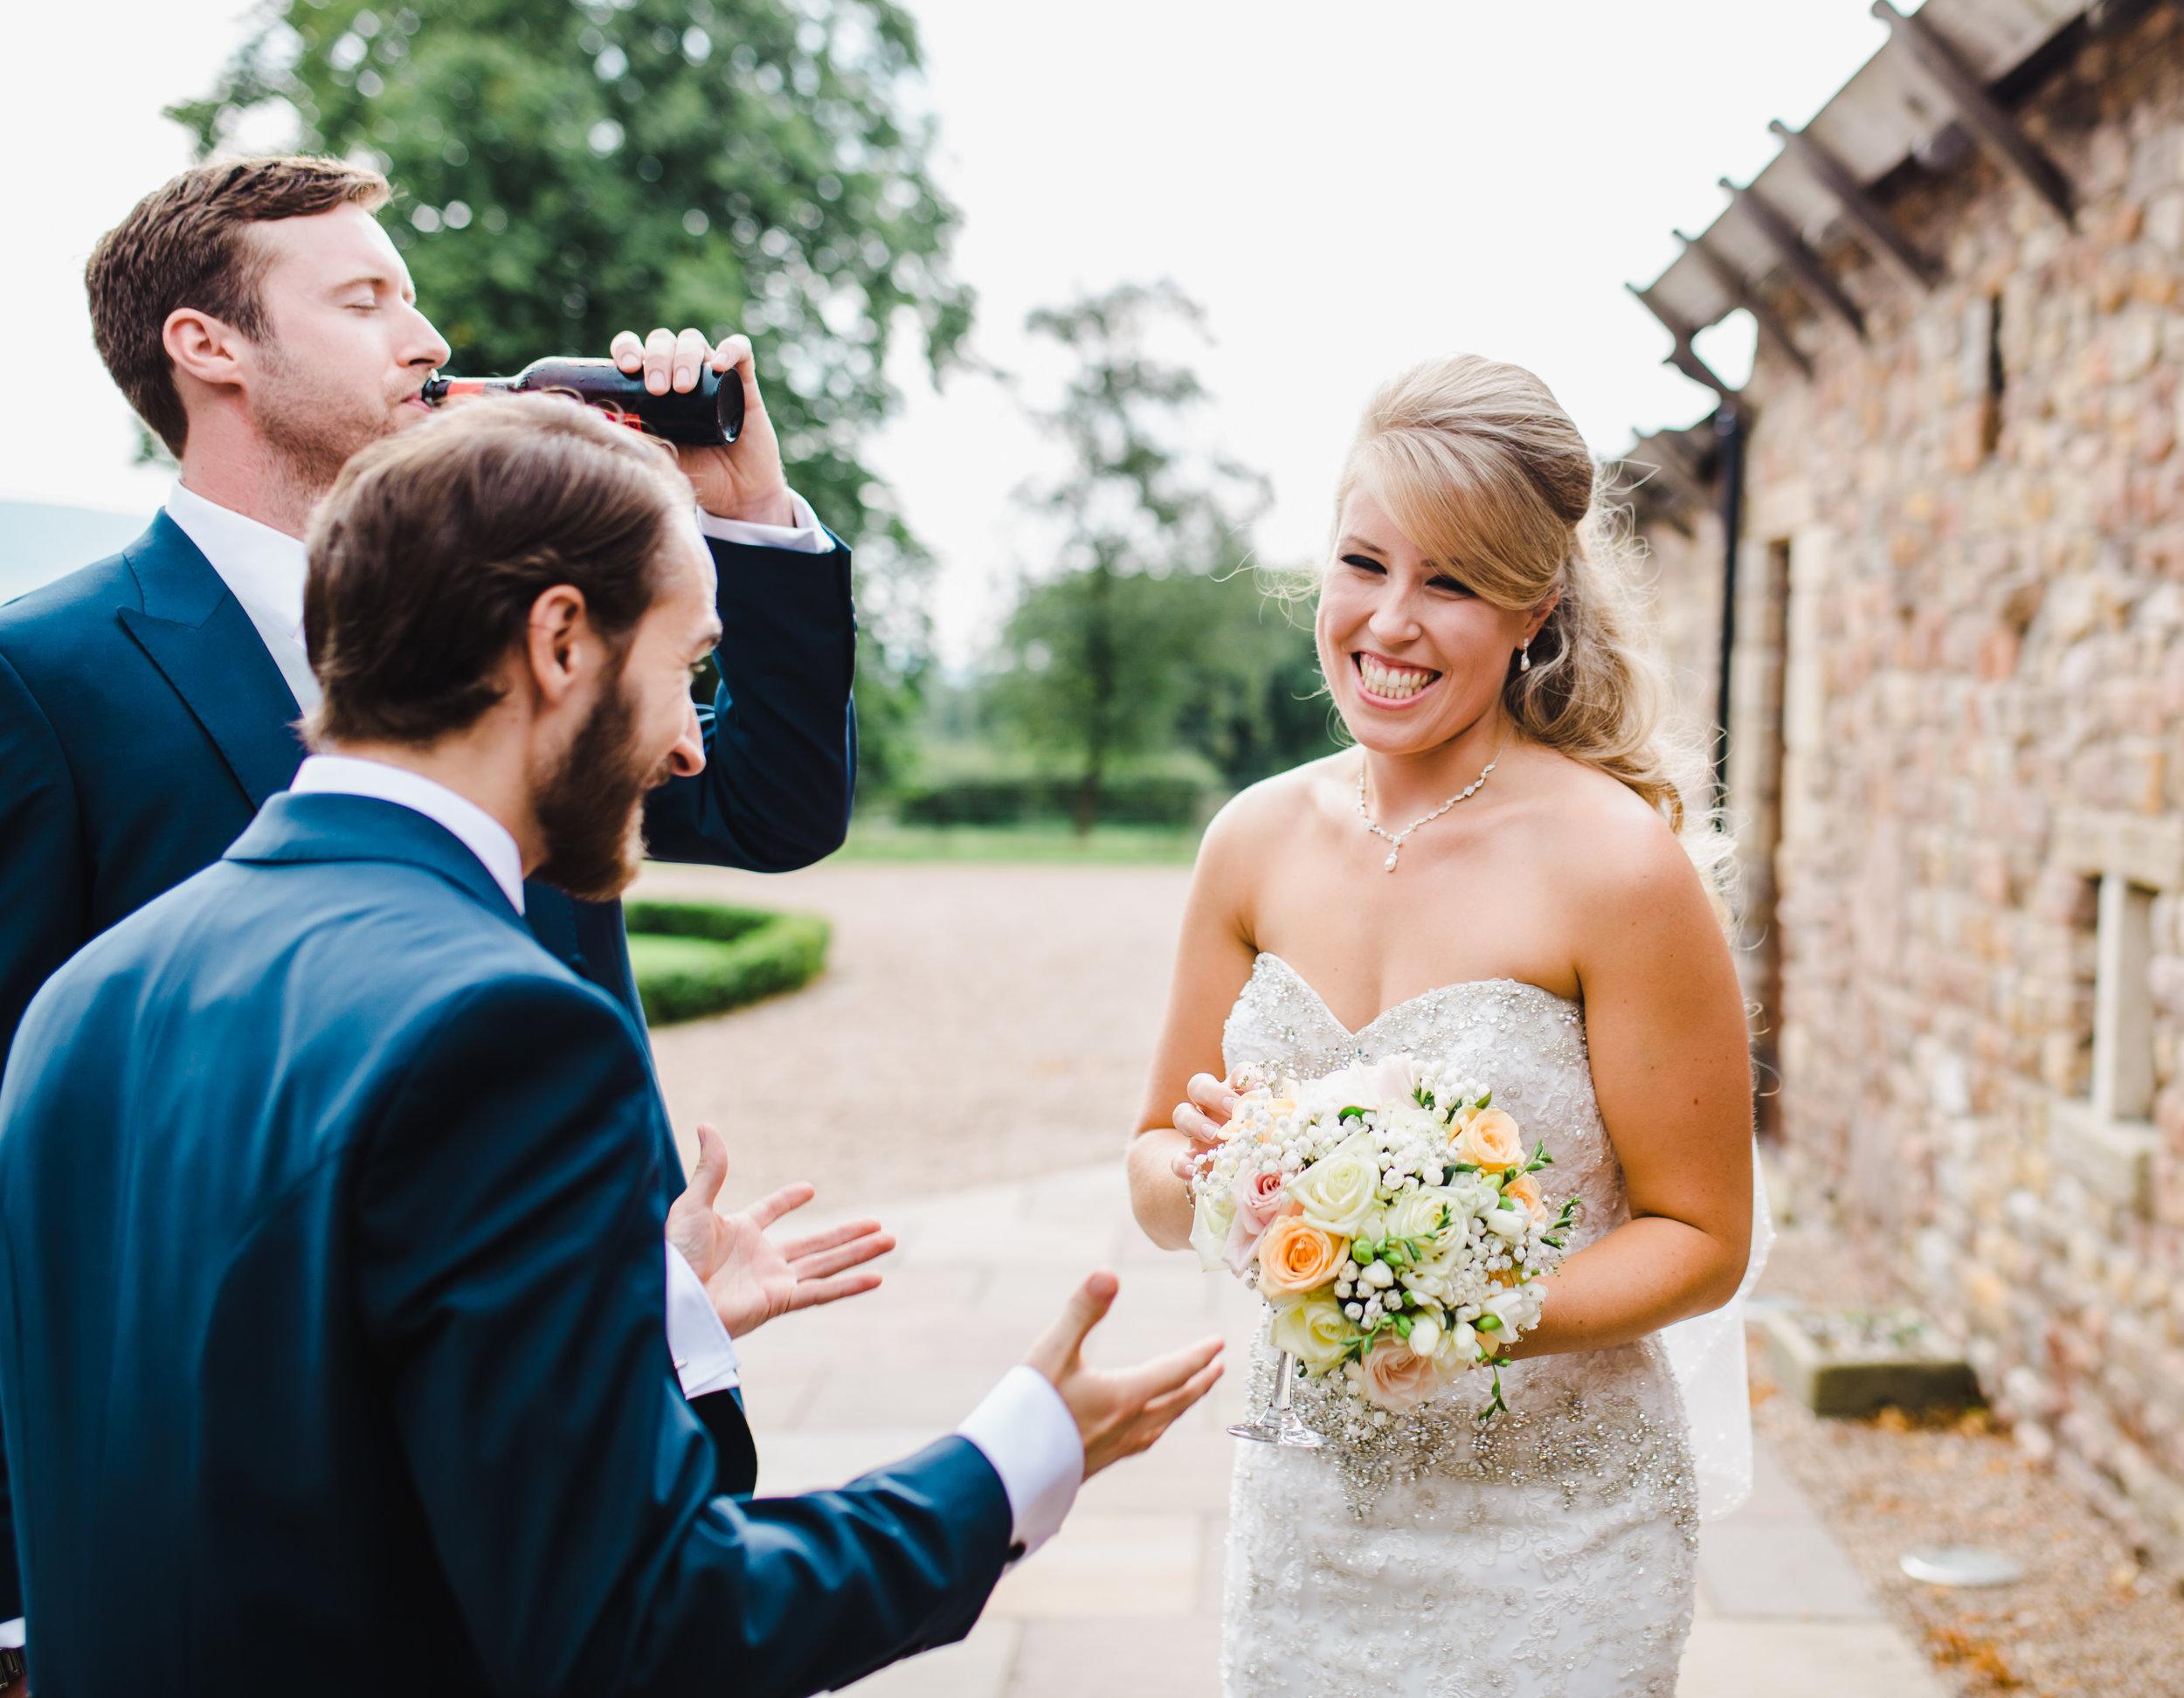 documentary wedding photography Lancashire - browsholme Hall wedding